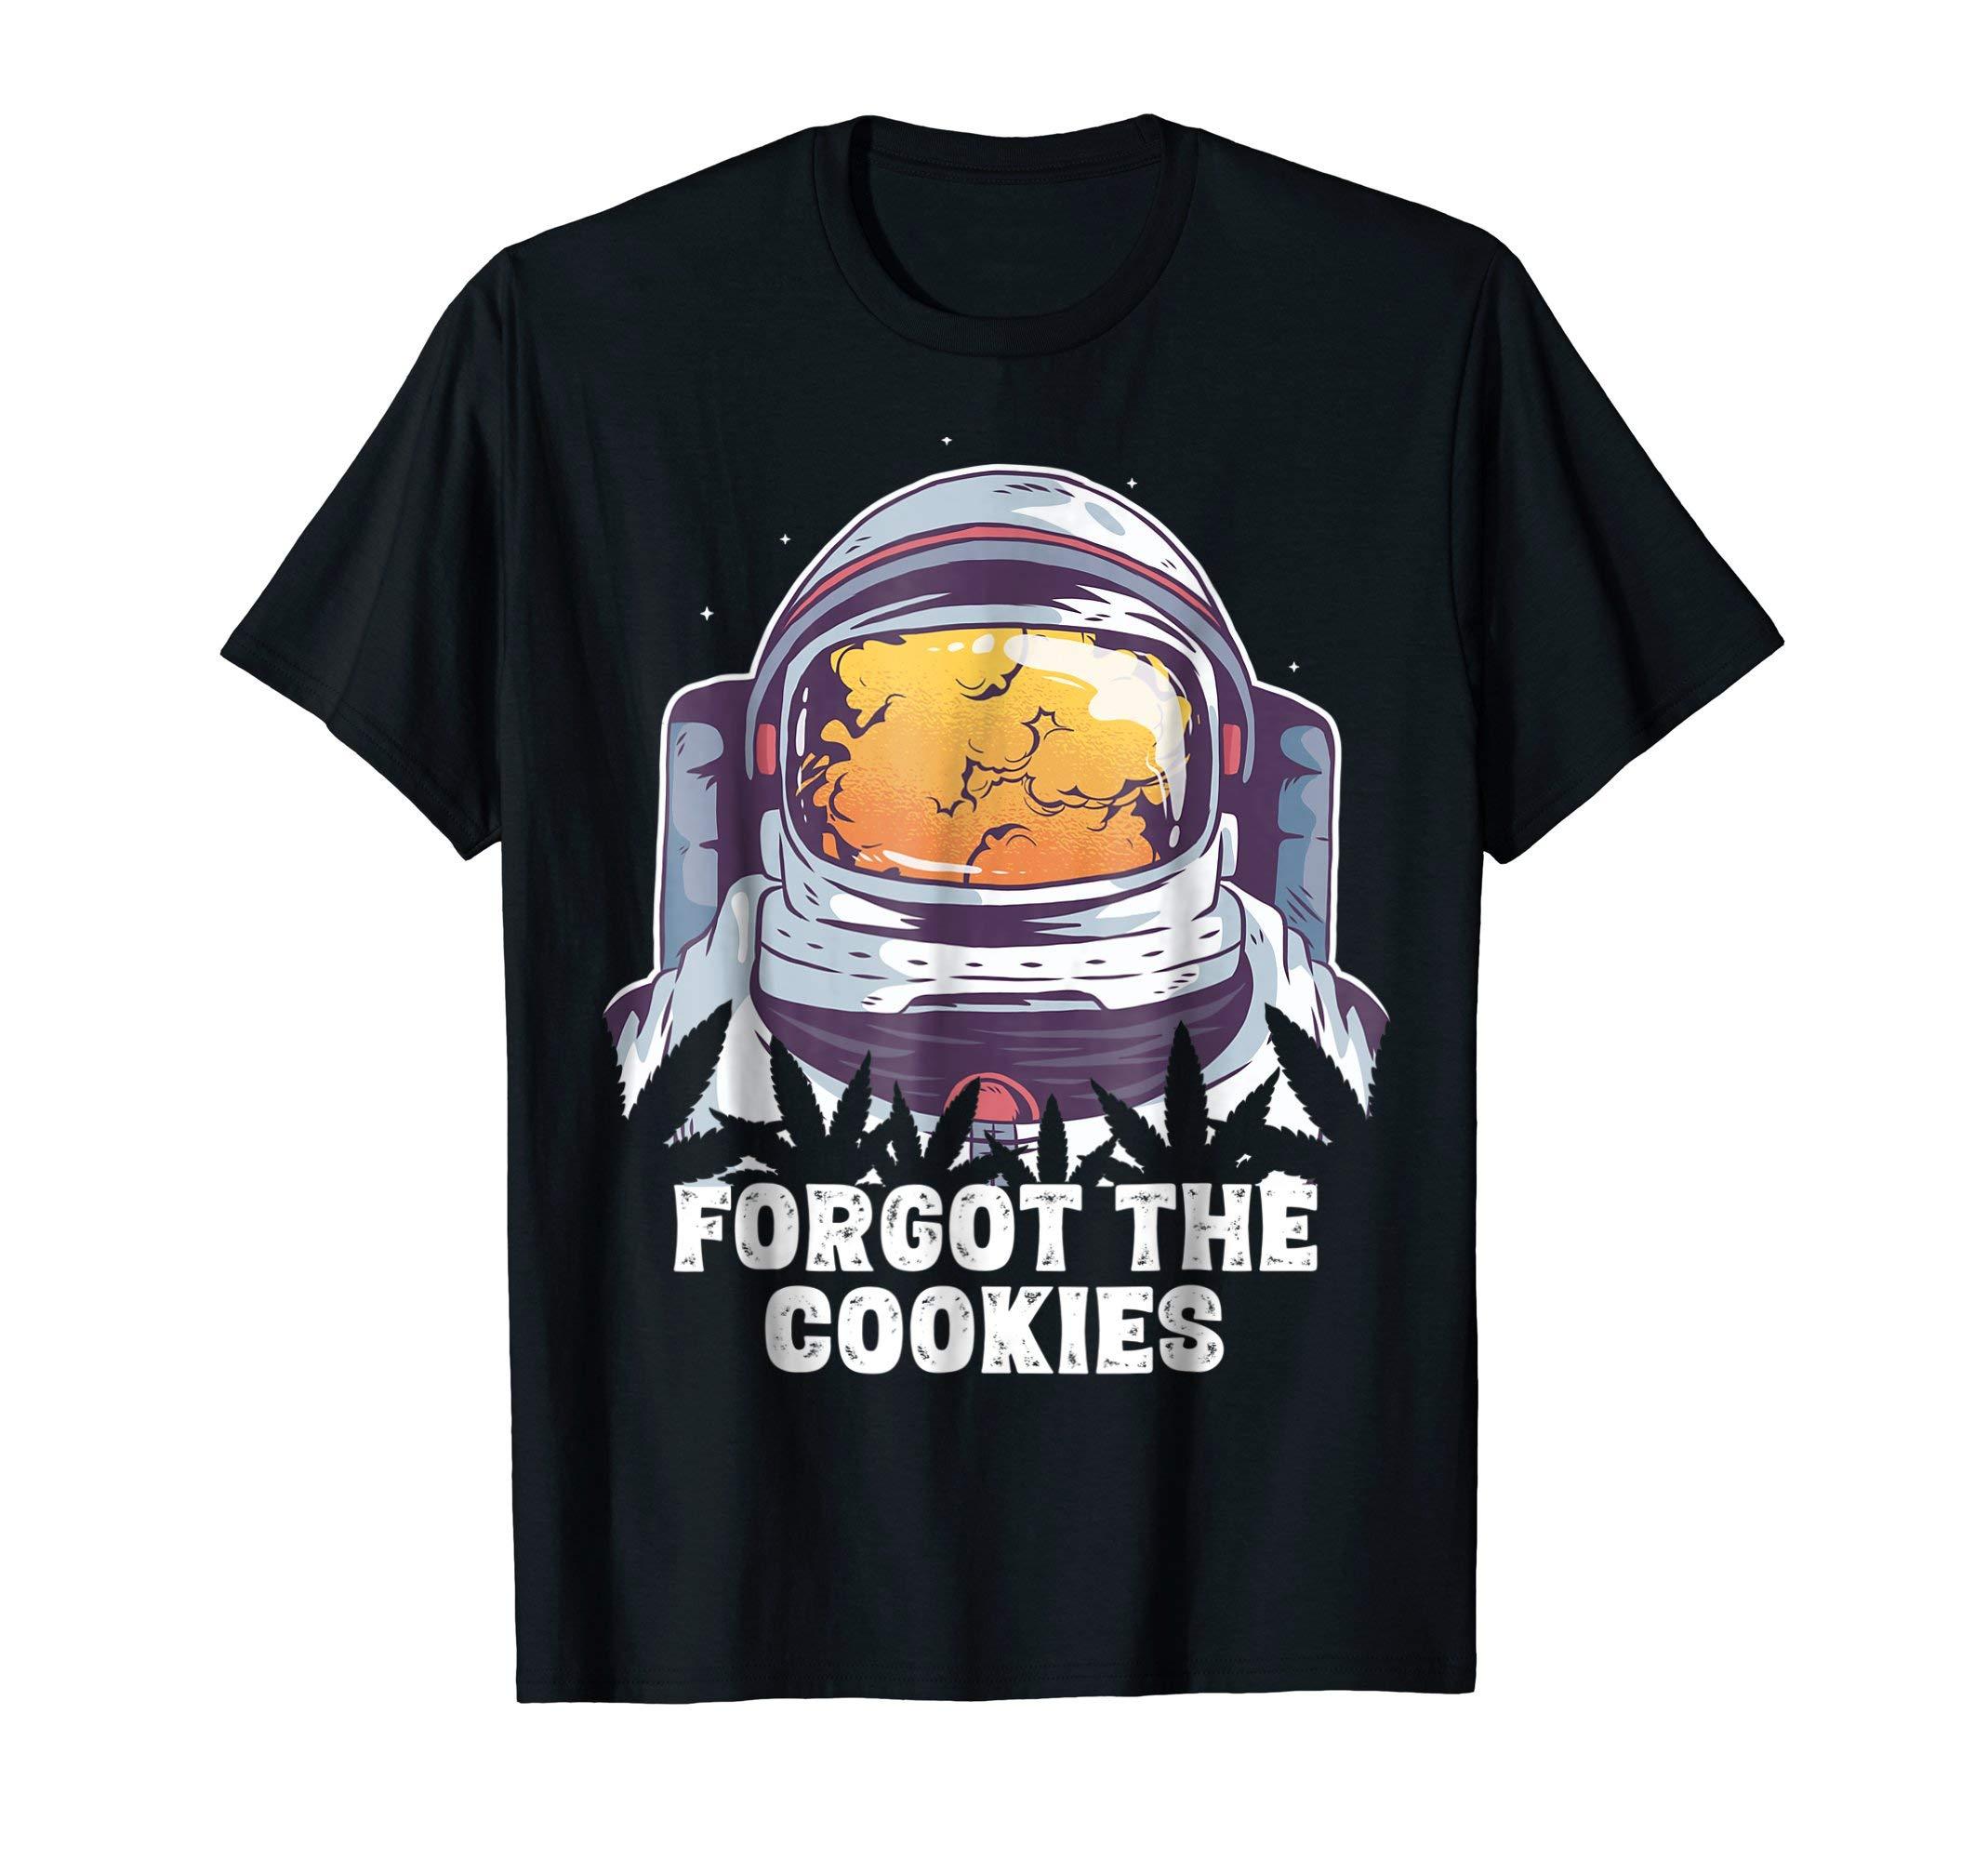 Astronaut Weed Shirt, Forgot The Cookies Funny Cannabis Tee